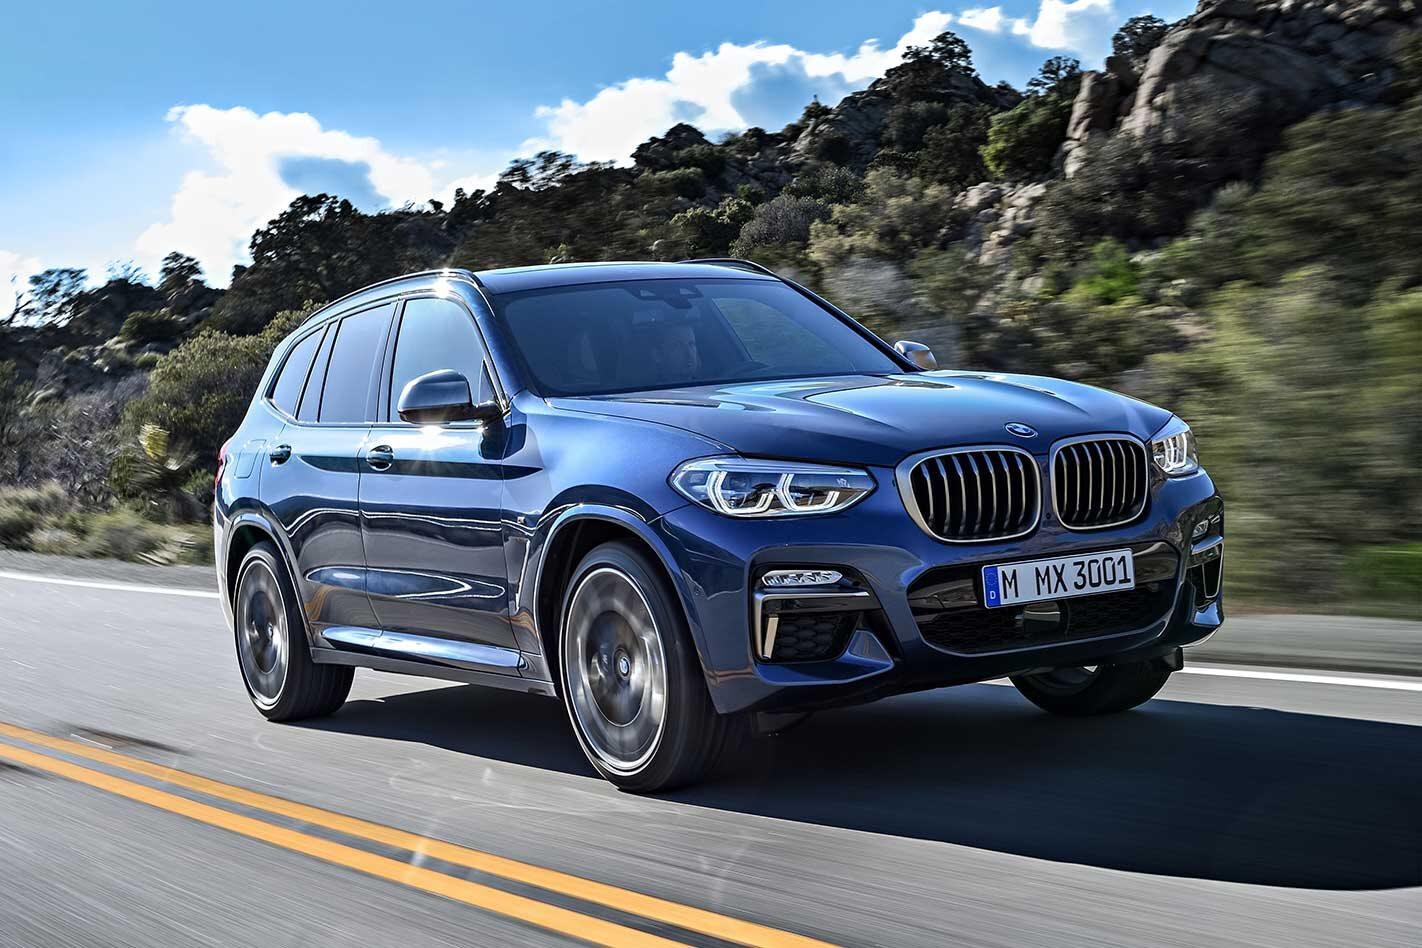 2019 BMW X3 M40i performance review